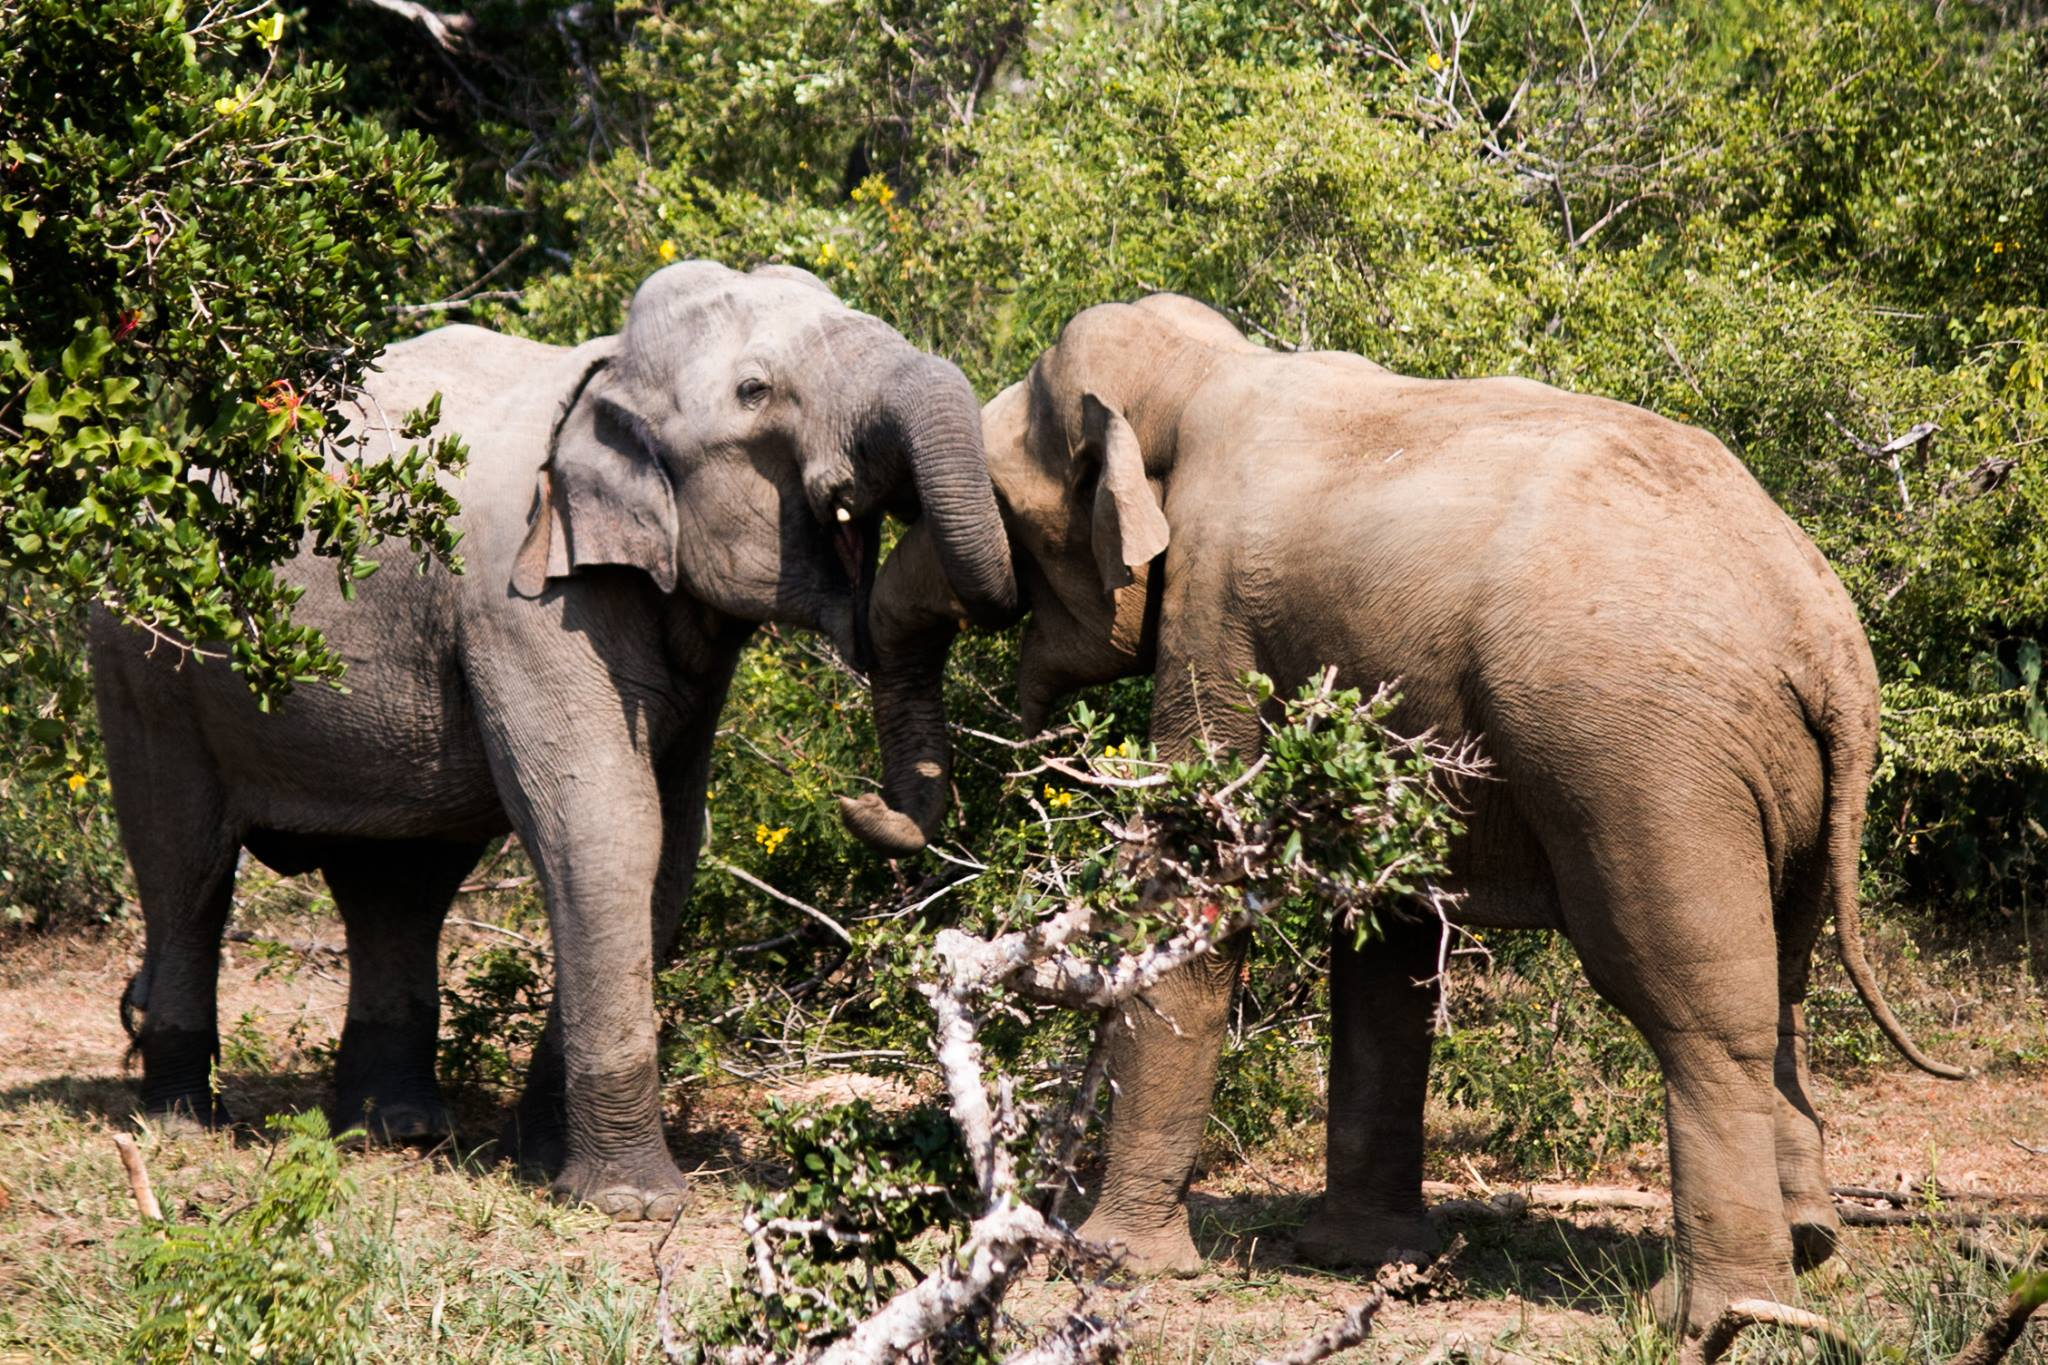 invite-to-paradise-sri-lanka-and-maldives-specialists-travel-agent-tour-operator-customer-review--feedback-joel-rhian-elephants-7.jpg